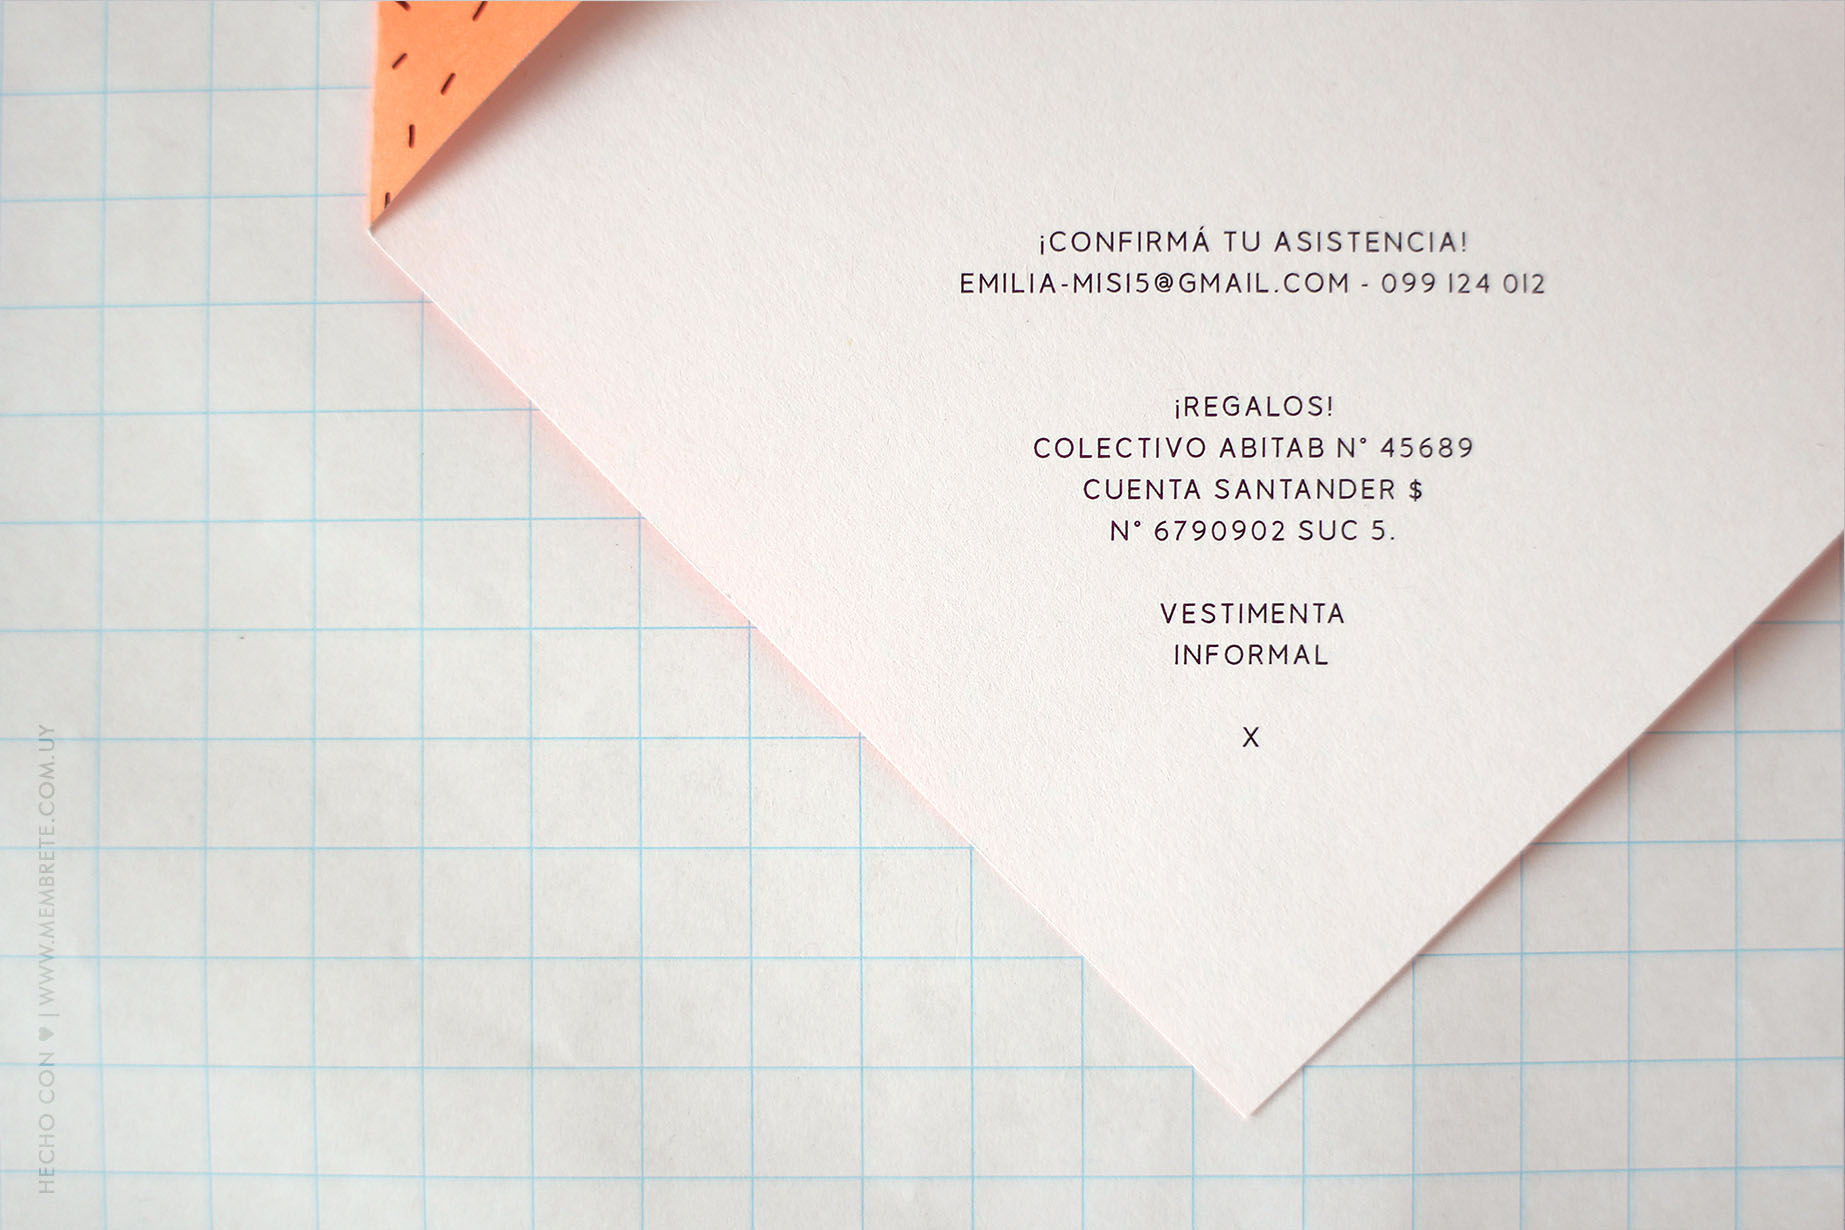 Emilia Flúo ♪ Fiesta 15 | Membrete | Invitaciones en papel | www.membrete.com.uy